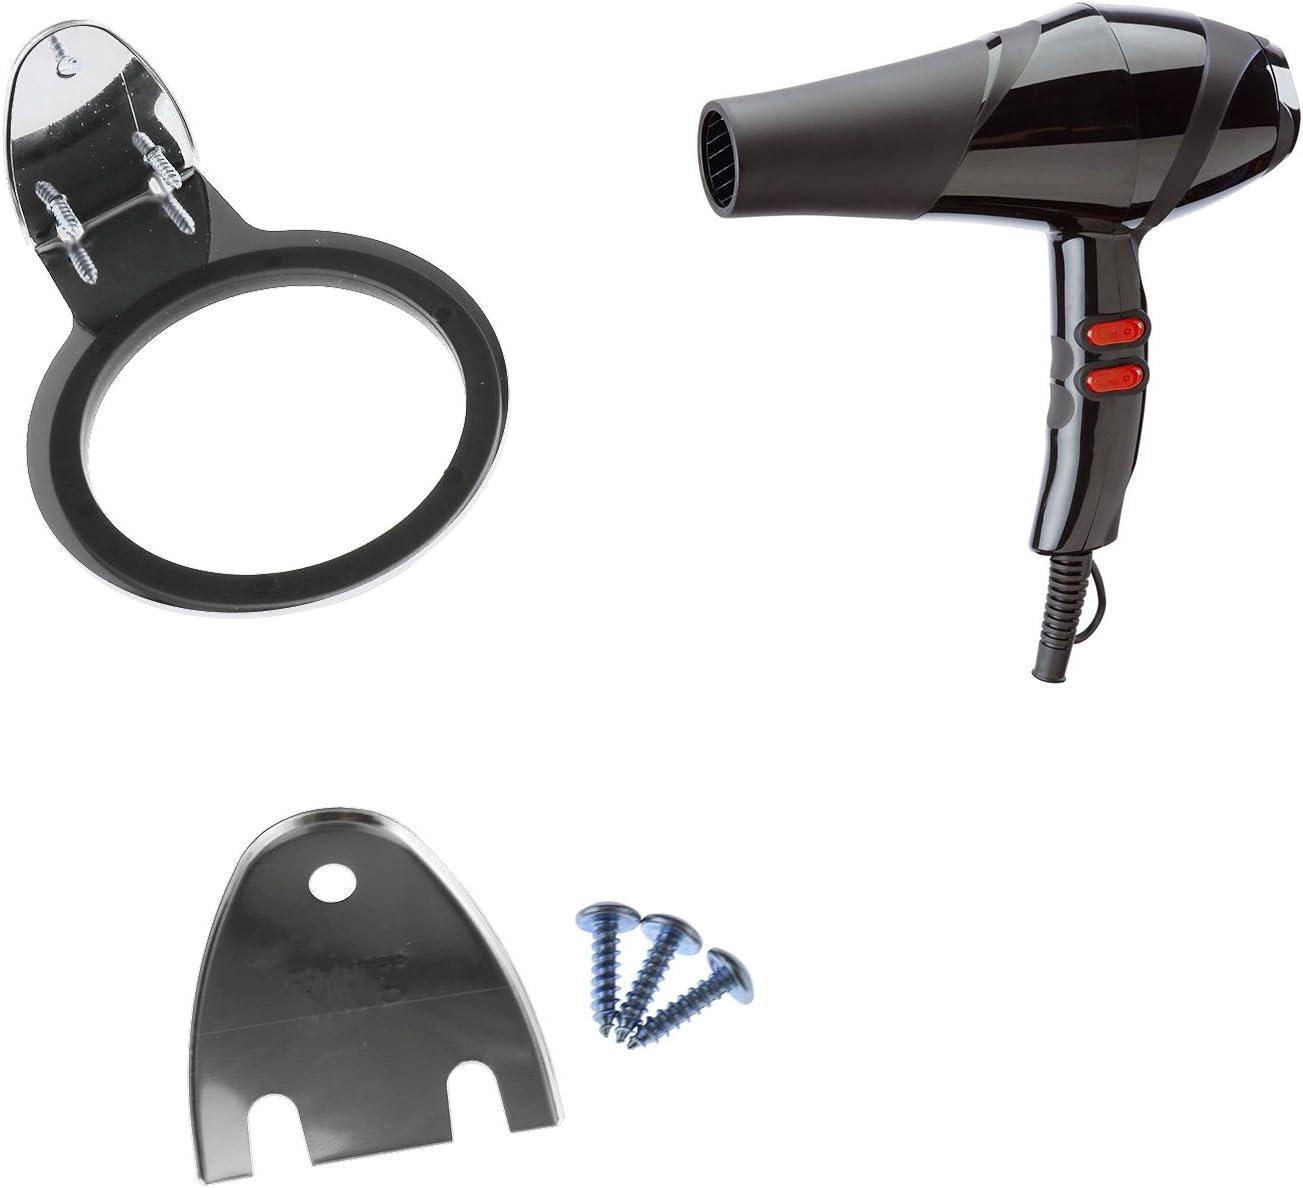 ENET Soporte para secador de pelo de acero inoxidable para ba/ño